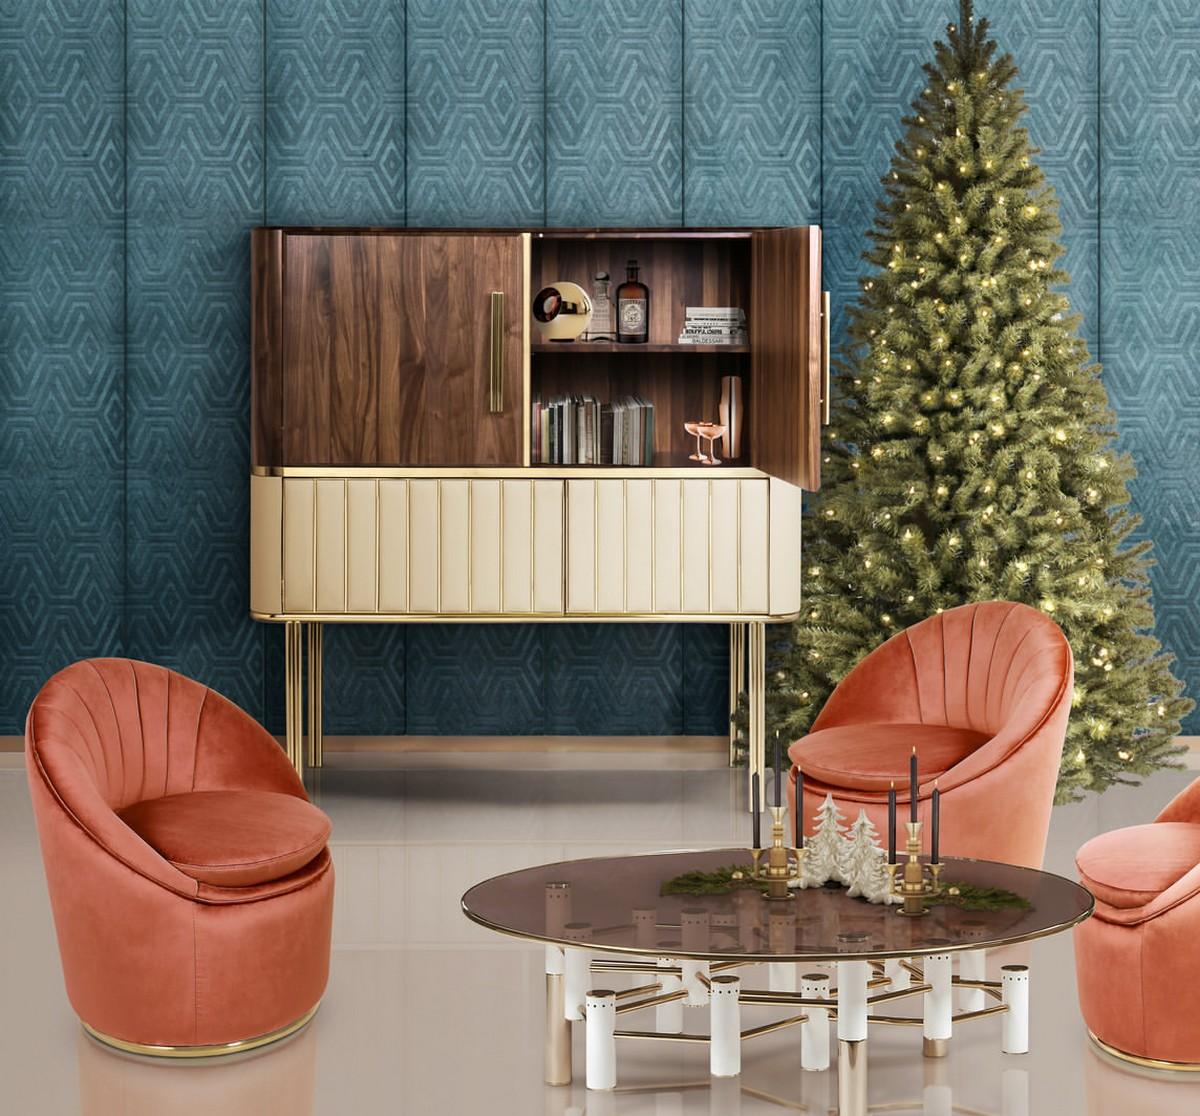 christmas, Christmas season, living room, living room decor, Christmas decor, luxury decor, luxury living room, center tables, interior design, ambiances,